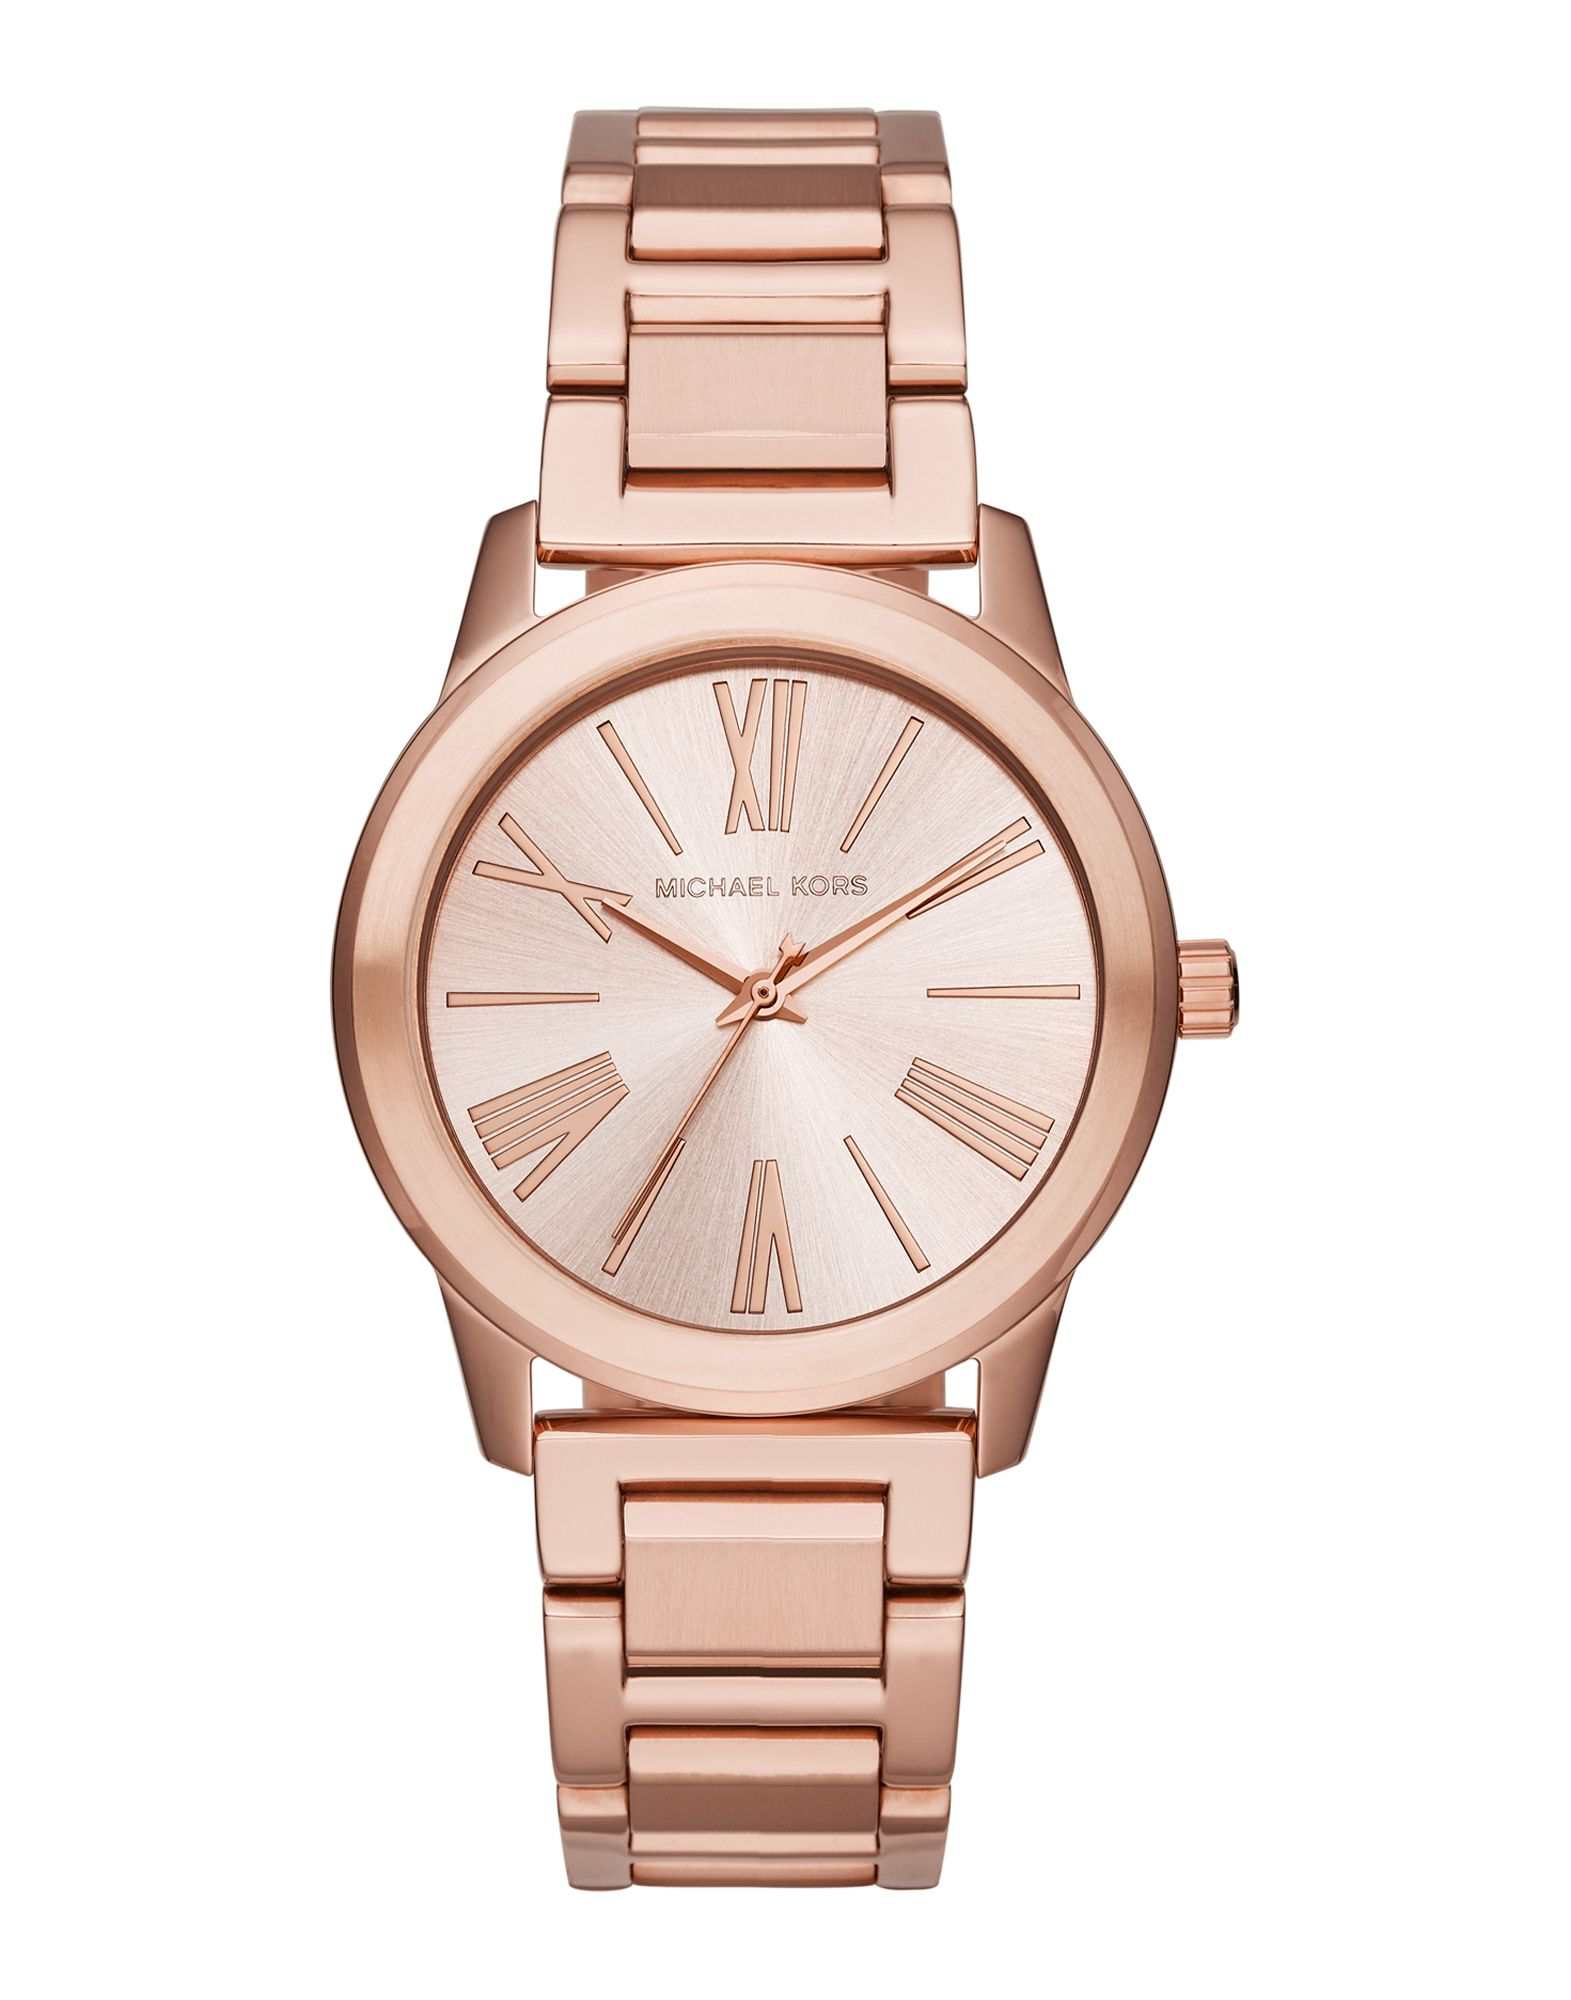 21f0a8aef716 Shop Michael Kors Wristwatch for Women - Obsessory